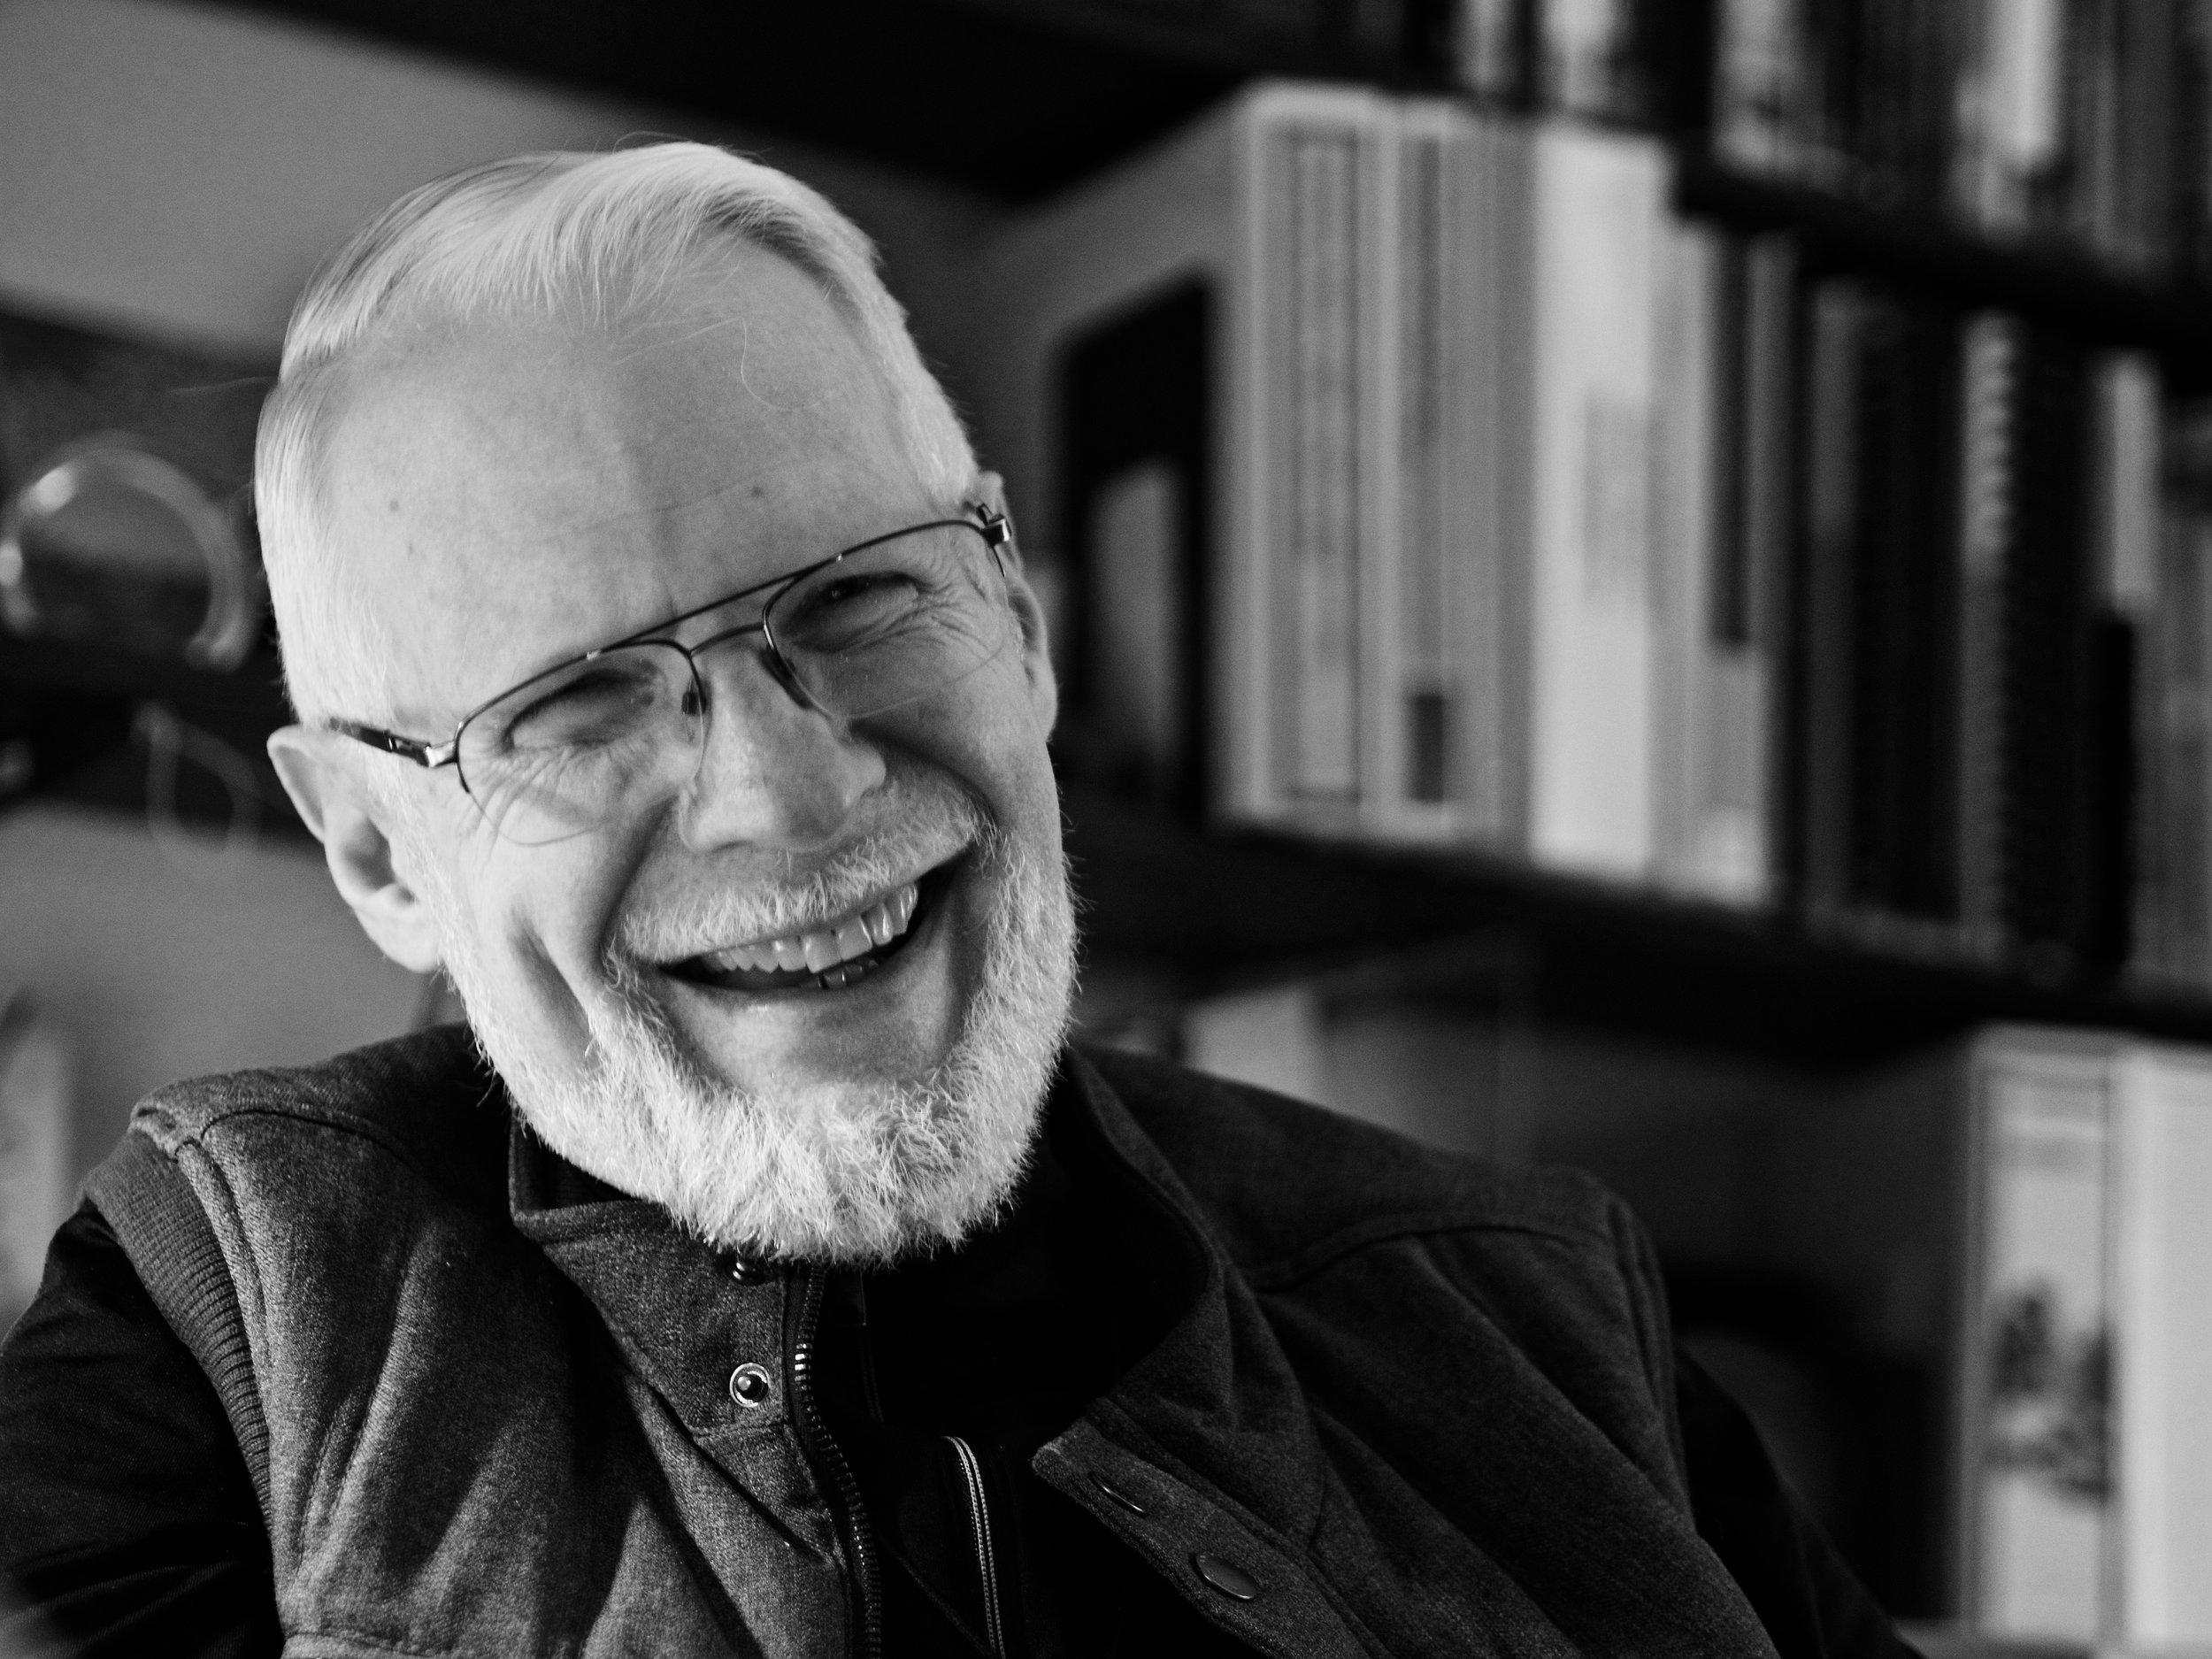 Dr. Stan McCracken, University of Chicago, 1/25/2017